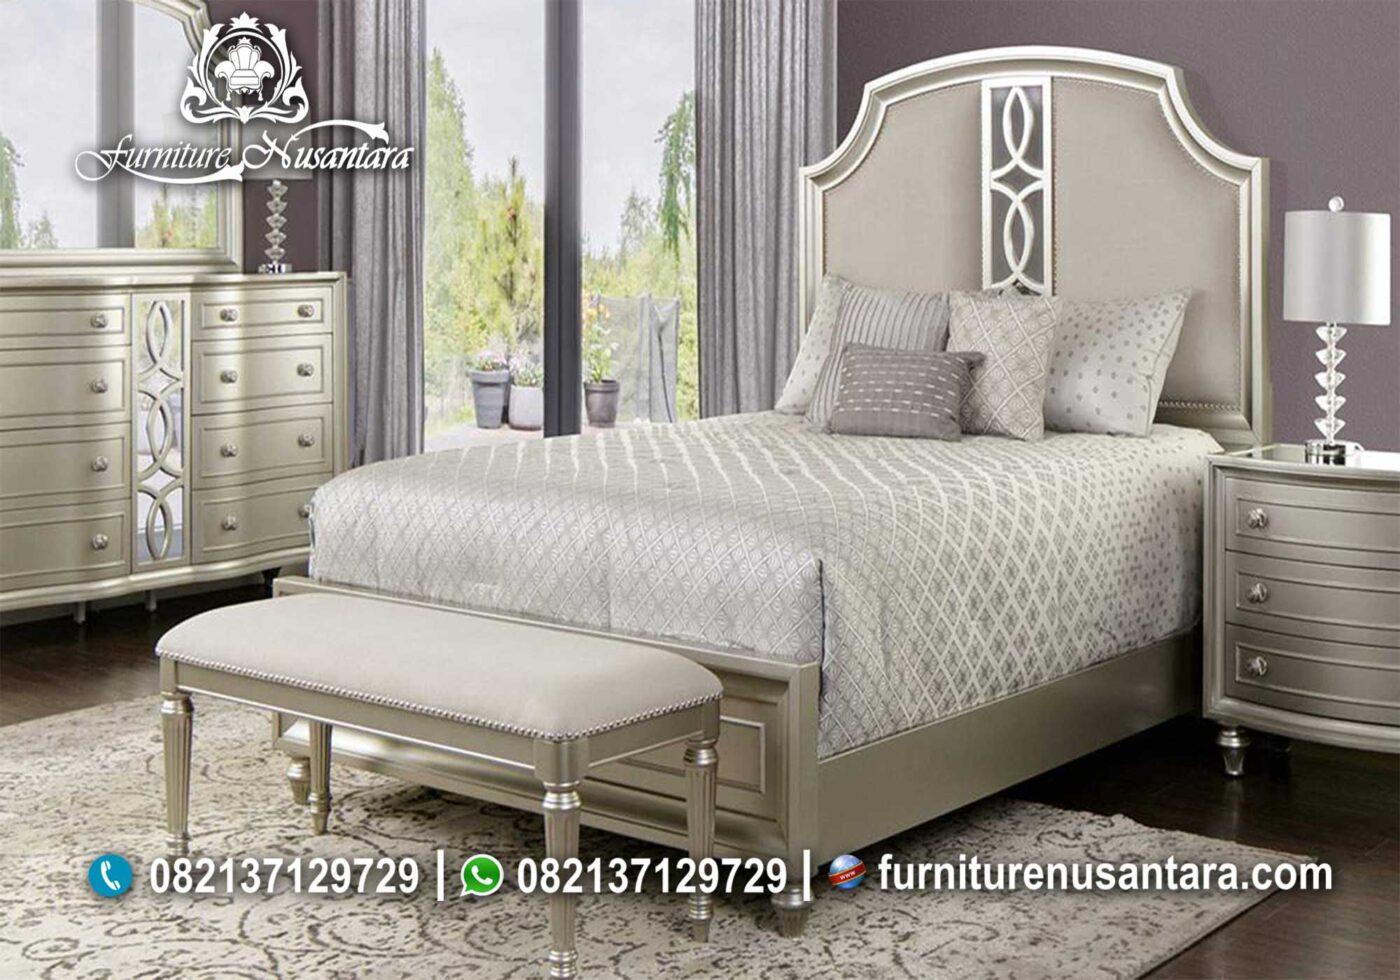 Jual Tempat Tidur Minimalis KS-61, Furniture Nusantara